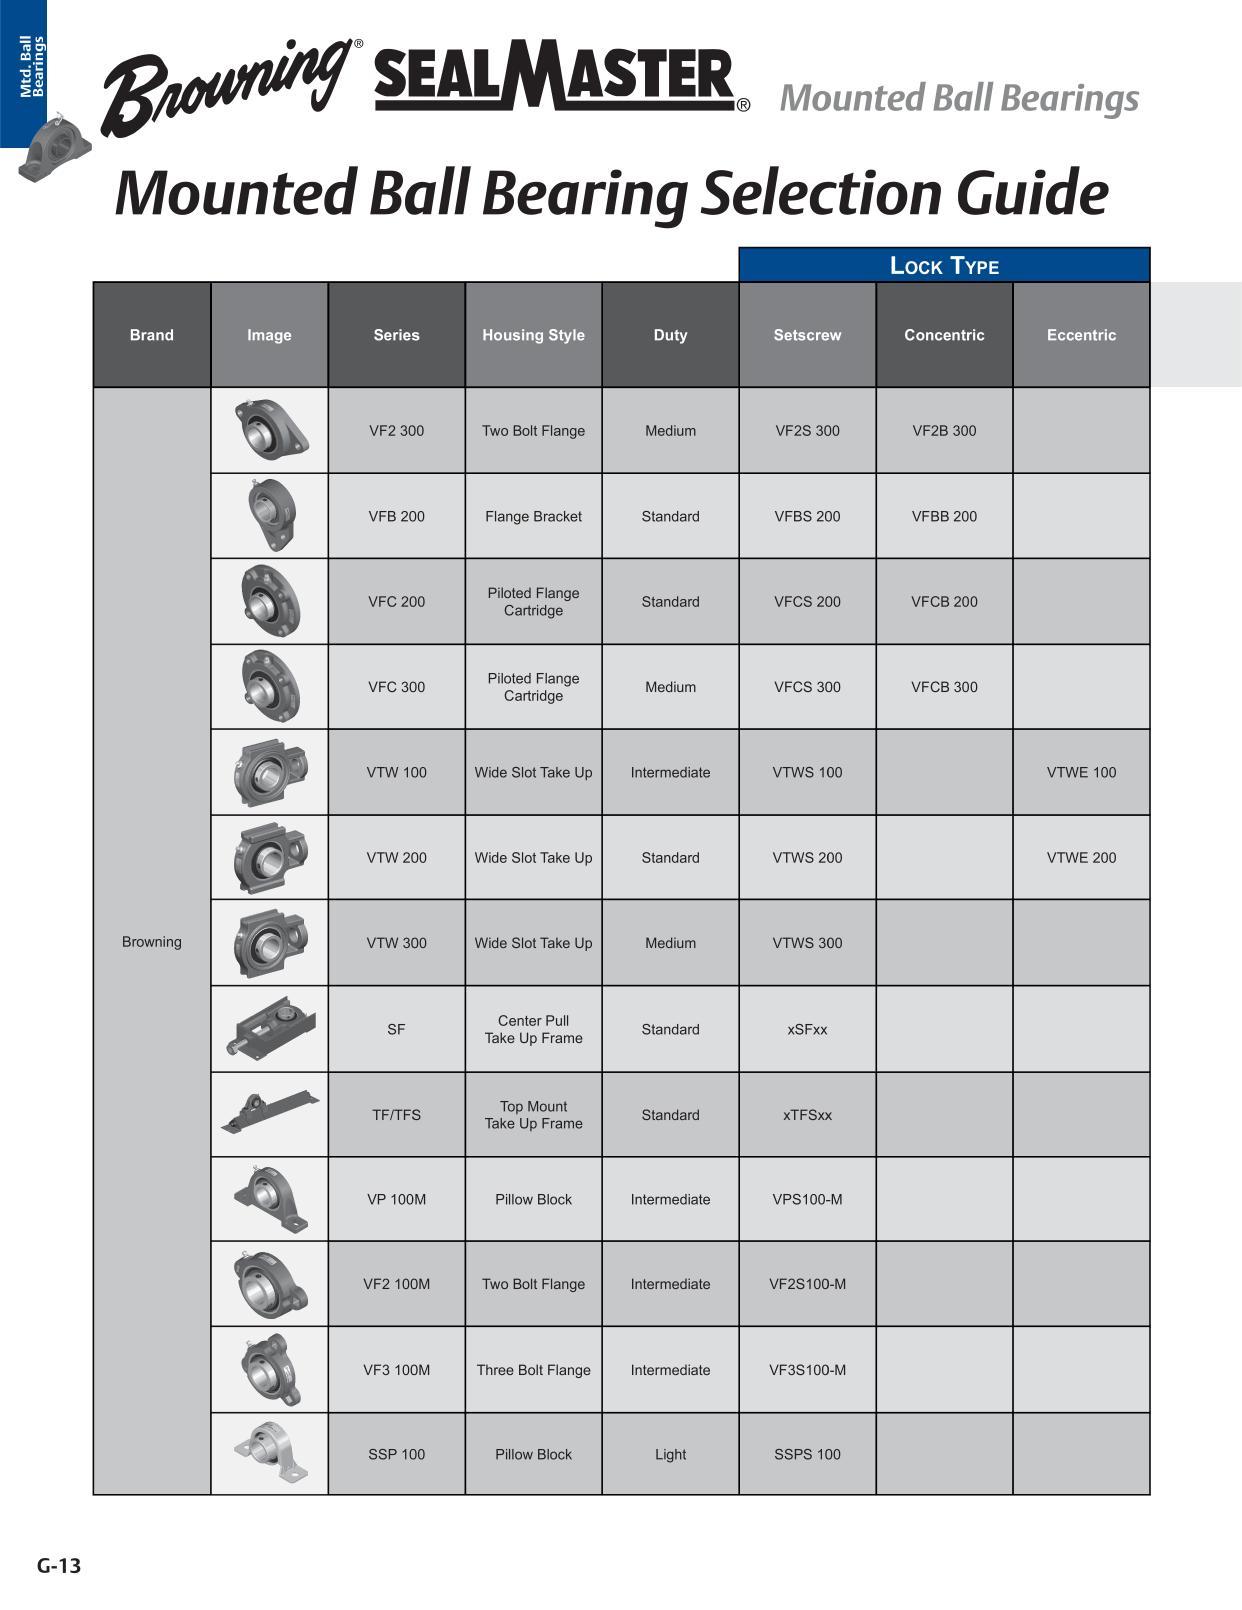 Mounted Ball Bearings - Bearing Product Catalog Page G-13